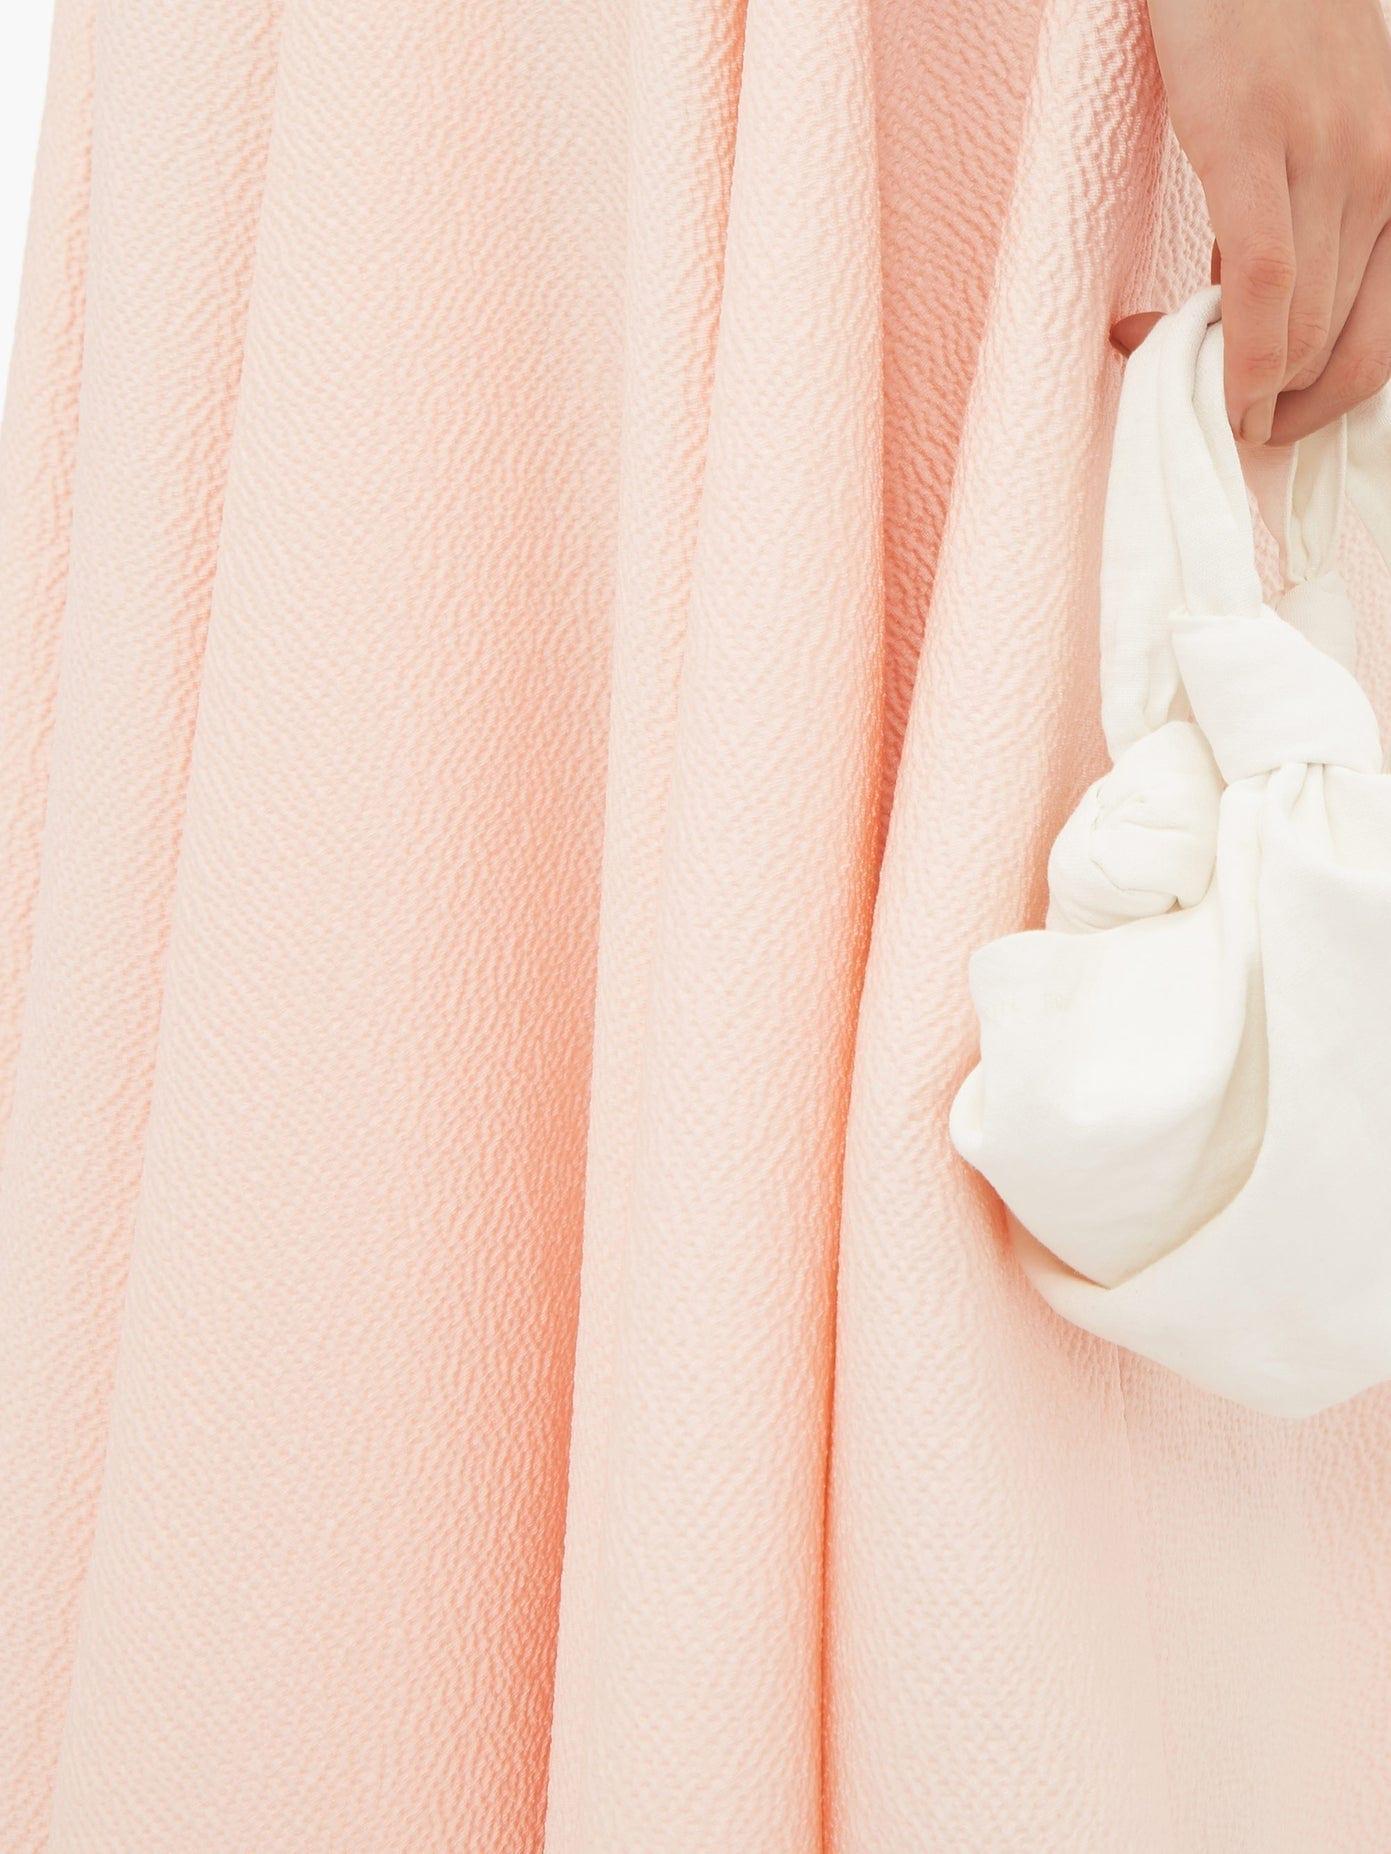 EMILIA WICKSTEAD Freya Double-cloque Dress